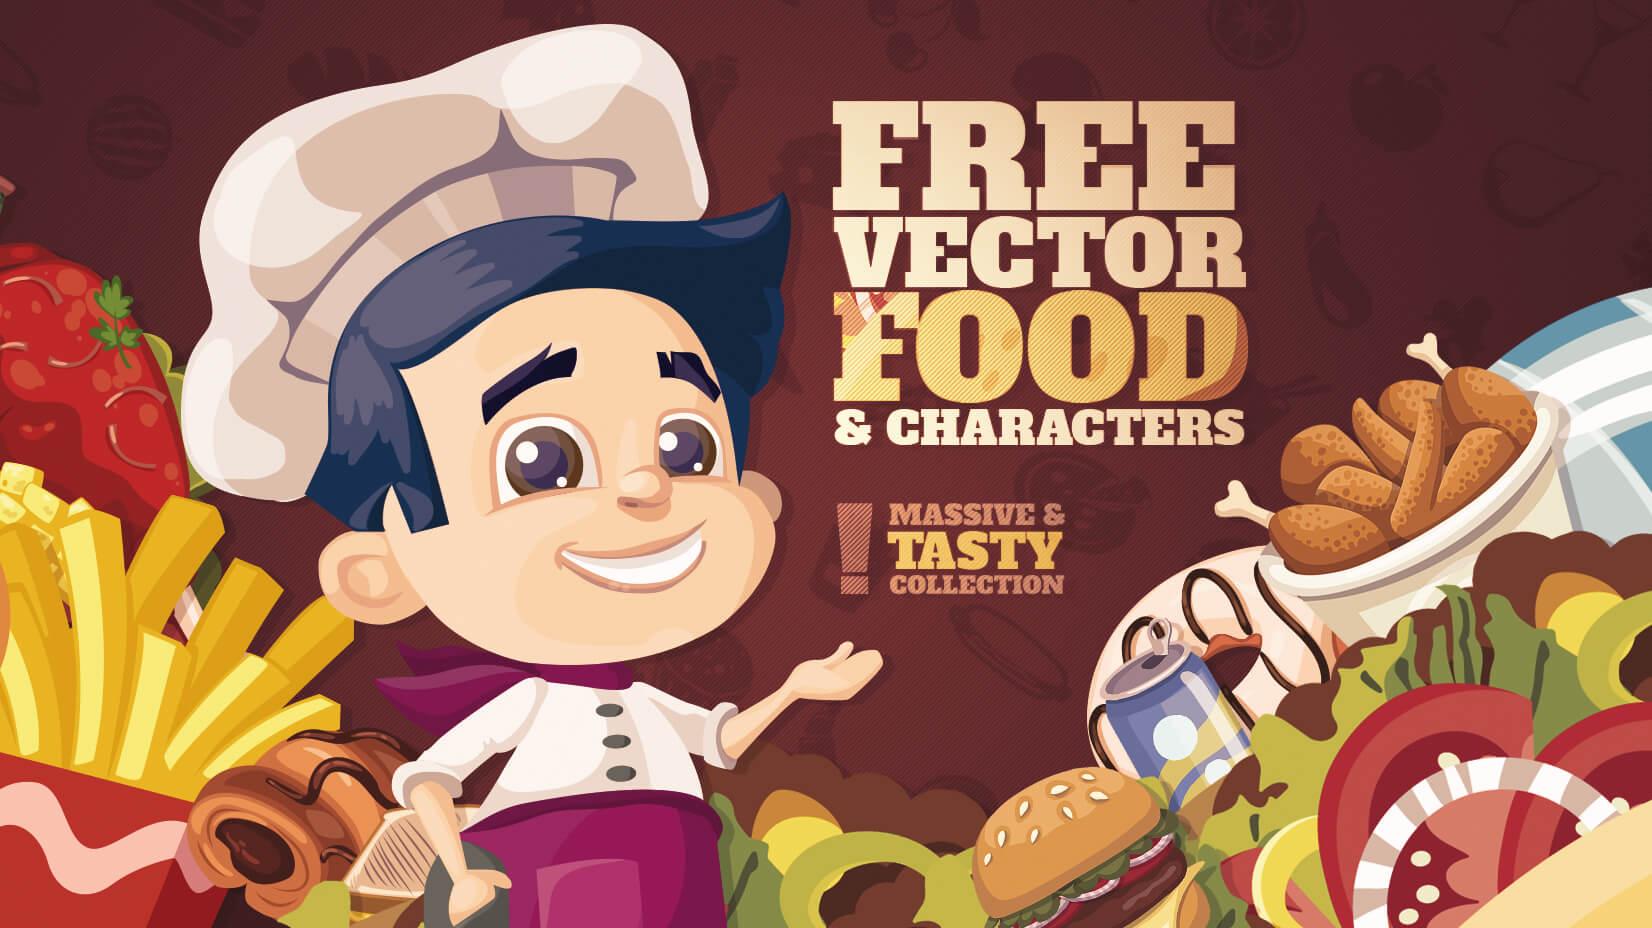 Food Vector Free